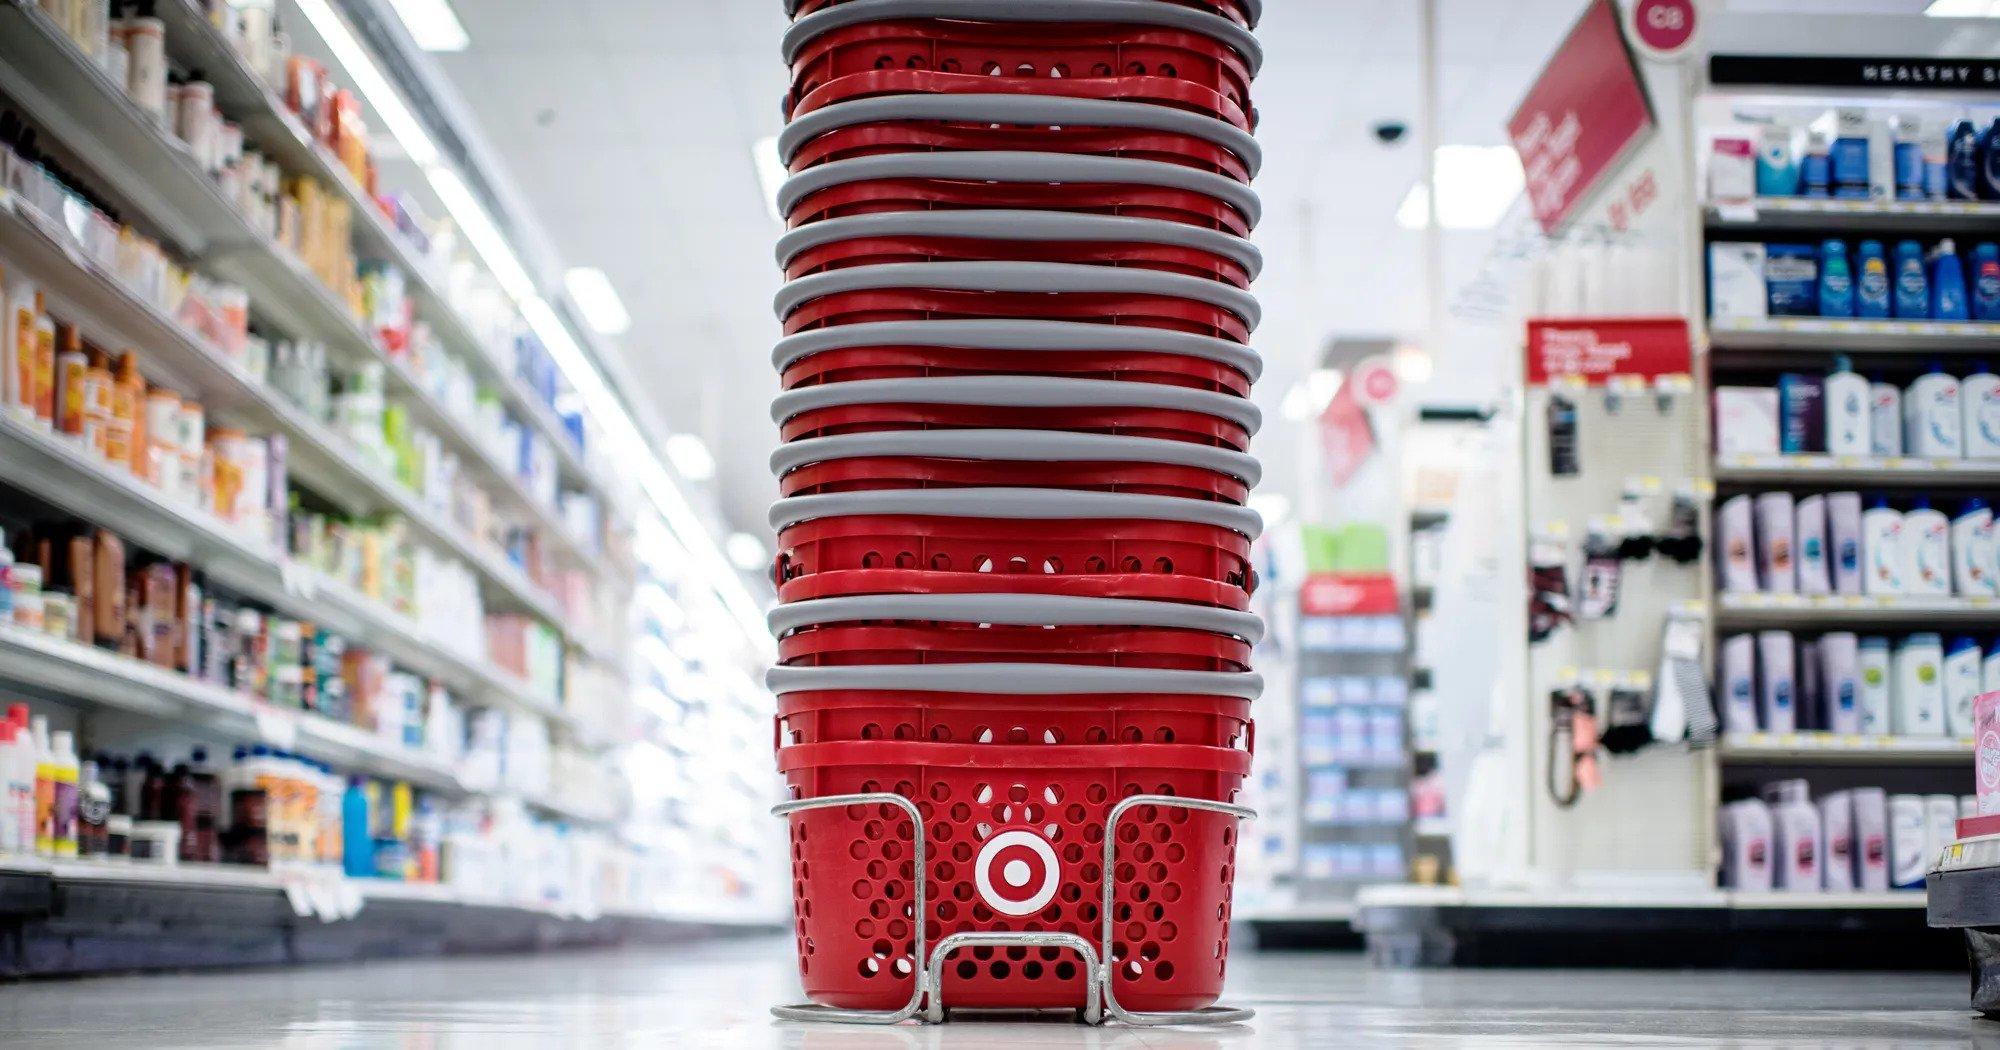 Stacked shopping carts between store isles